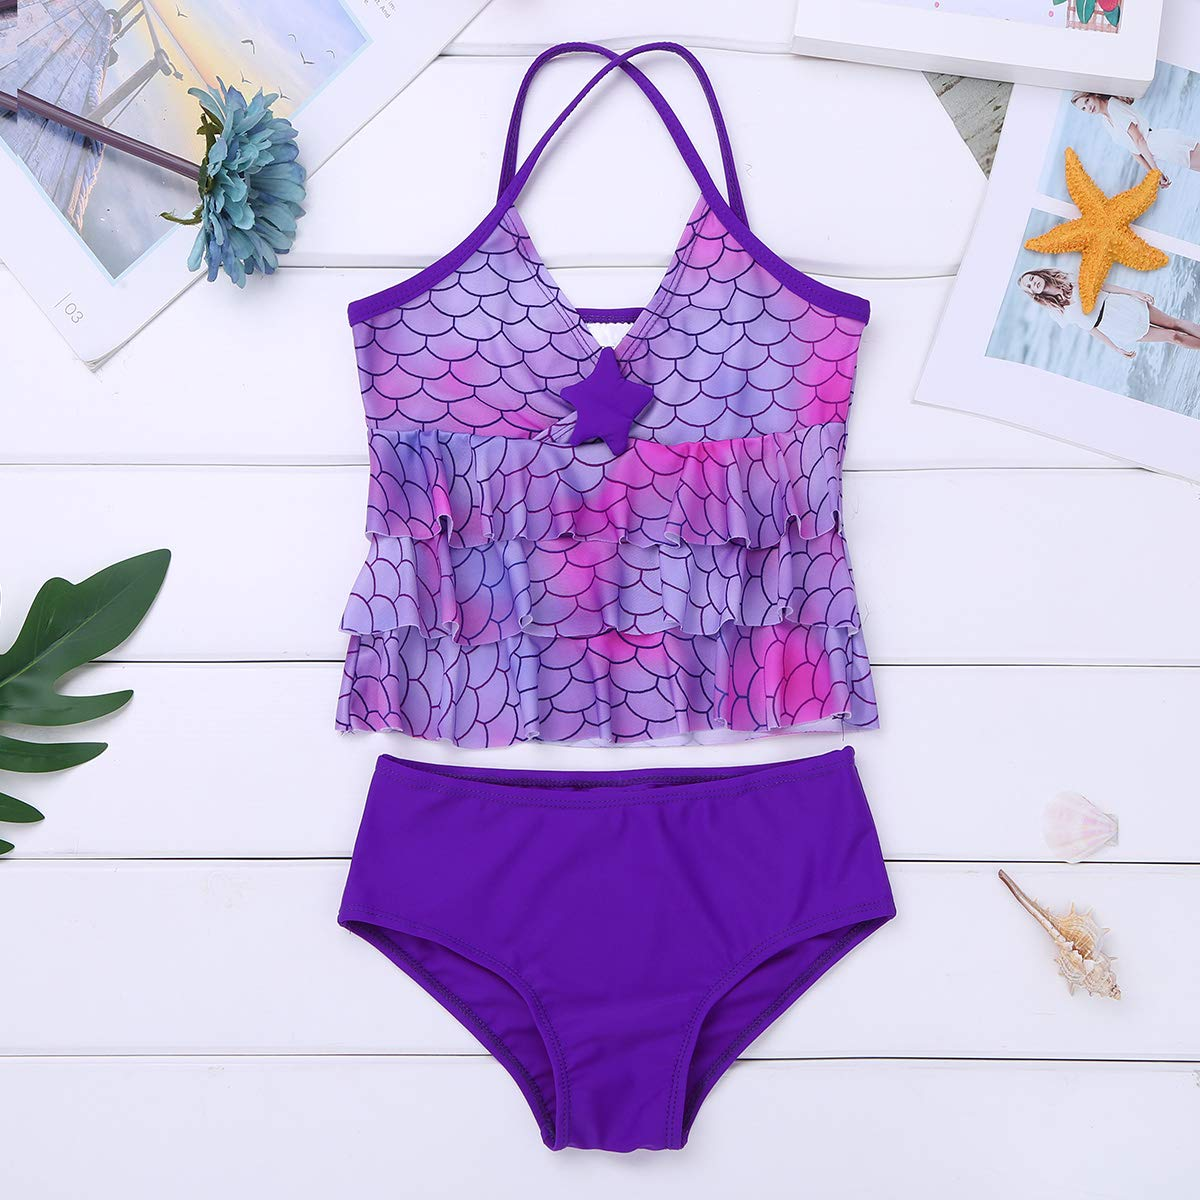 ranrann Girls Two-Piece Tankini Mermaid Scales Printed Starfish Tank with Bottoms Set Swimsuit